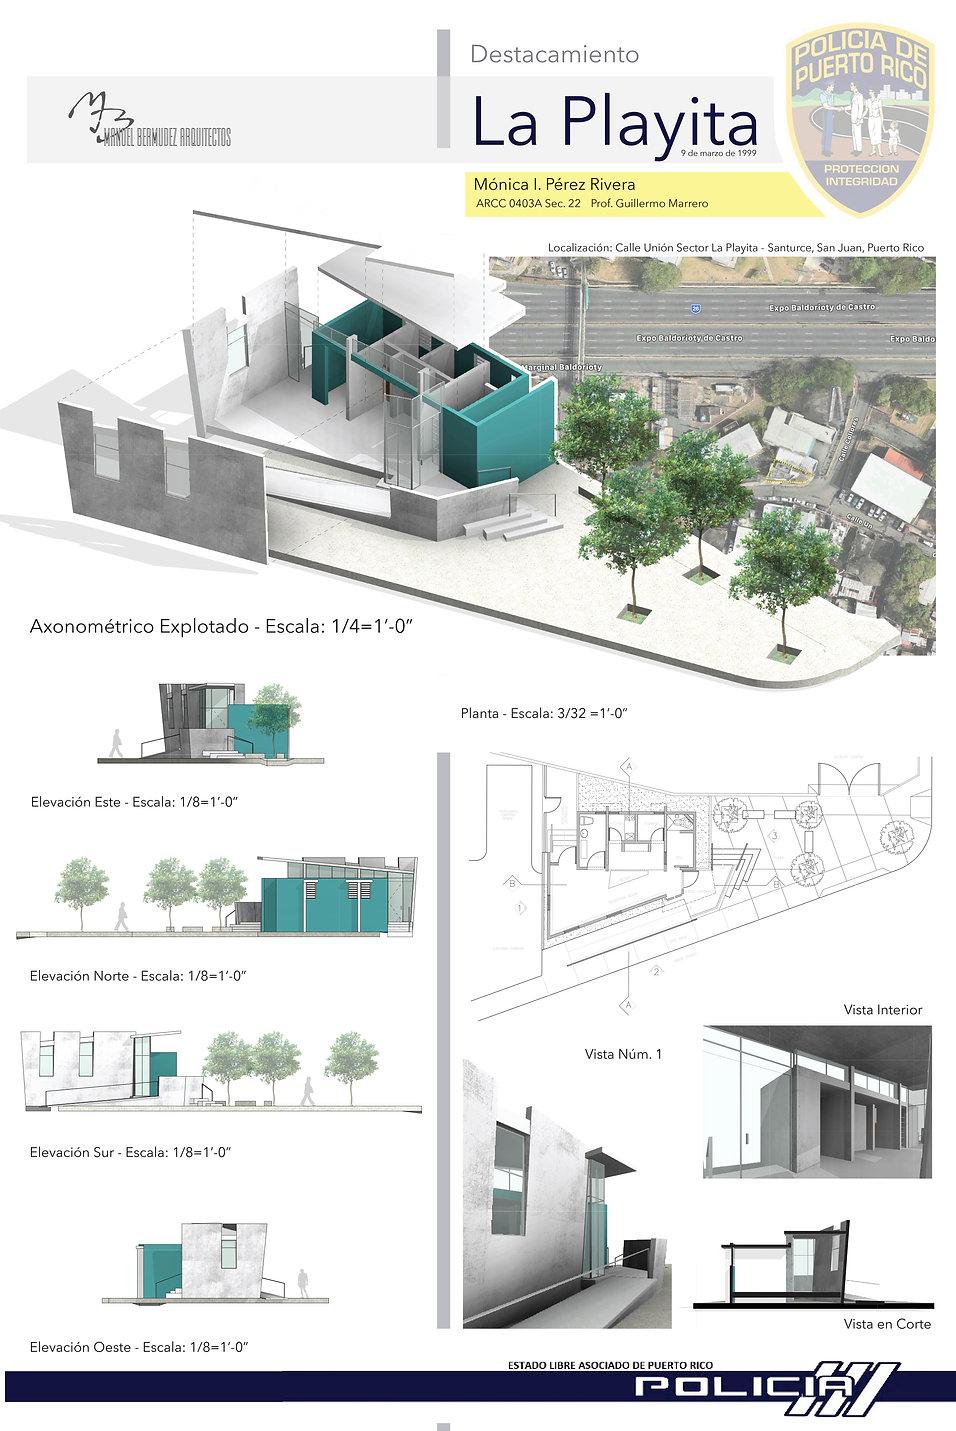 La Playita Police Station